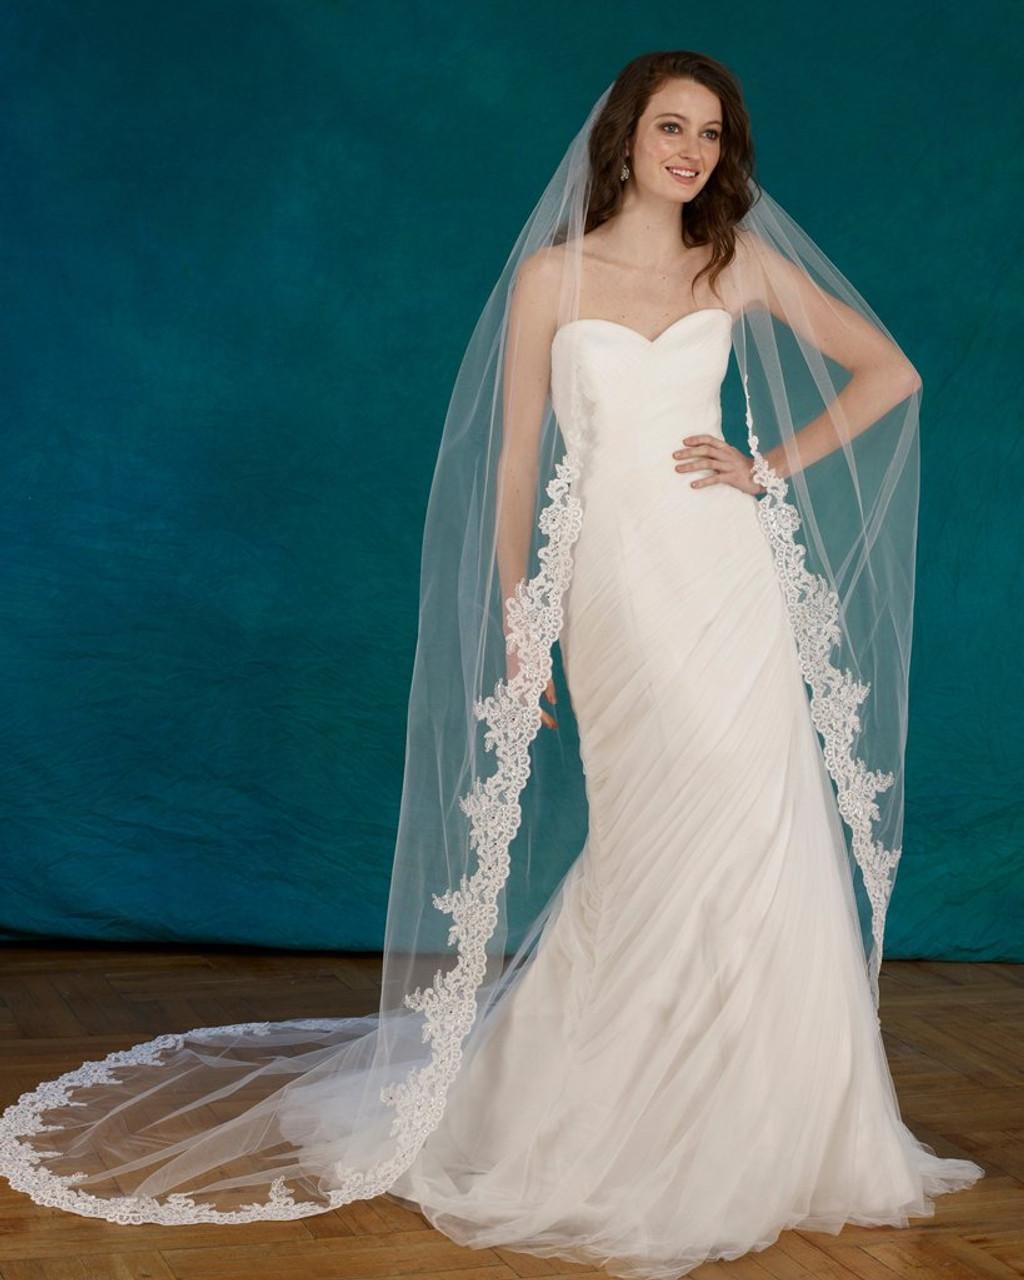 "Marionat Bridal Veils 3700 - 108"" Beaded alencon lace veil with rhinestones"